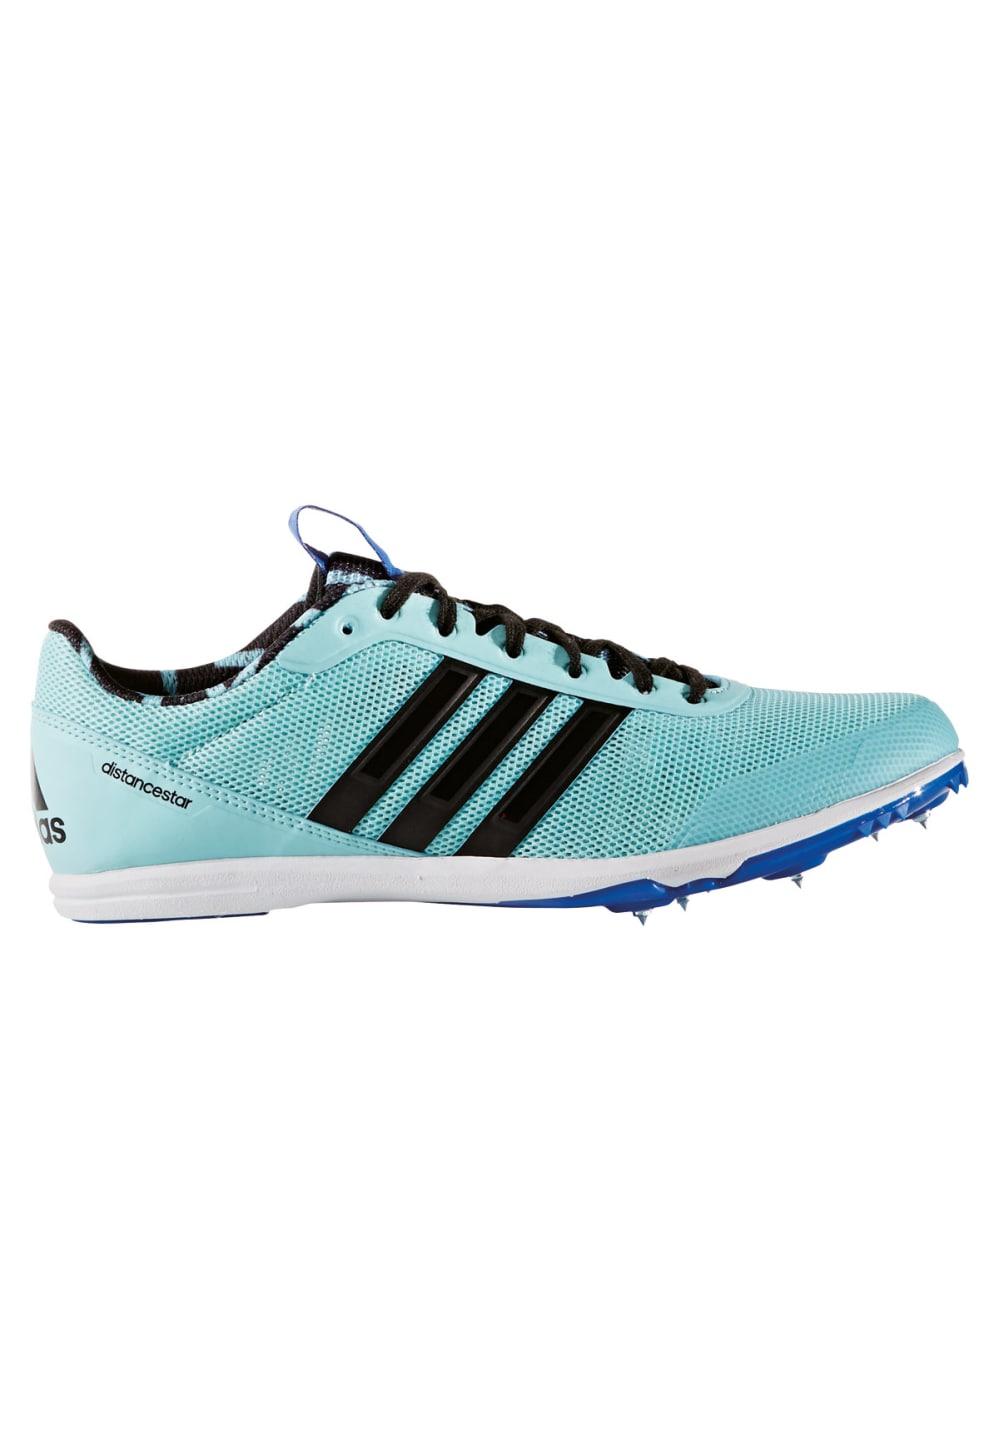 best website d67cf 6685d adidas Distancestar - Spikes für Damen - Blau  21RUN